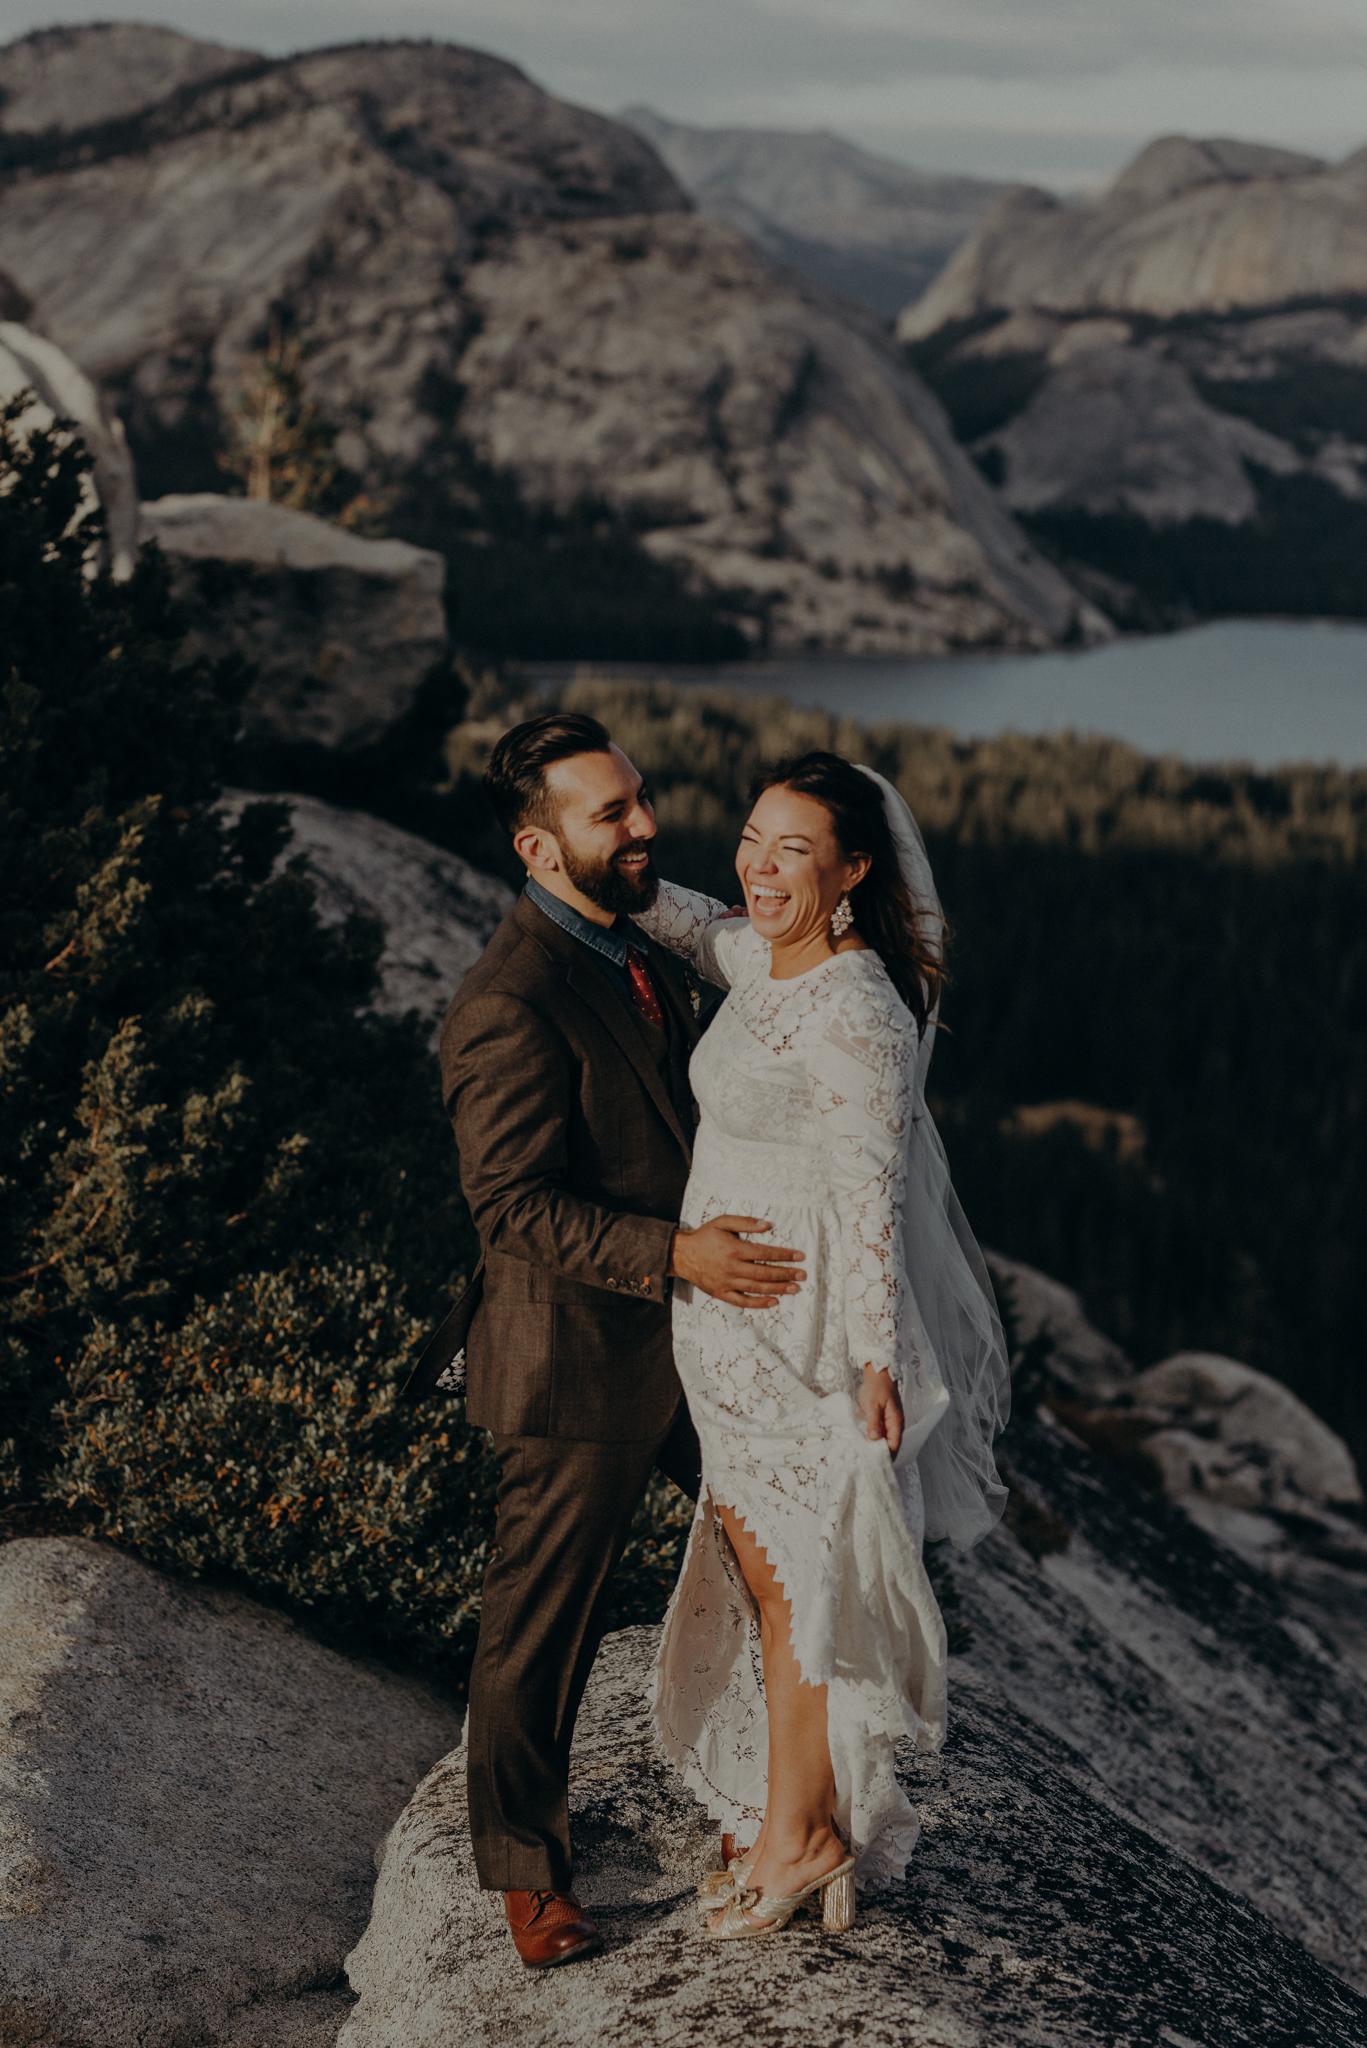 Yosemite Elopement Photographer - Evergreen Lodge Wedding Photographer - IsaiahAndTaylor.com-026.jpg